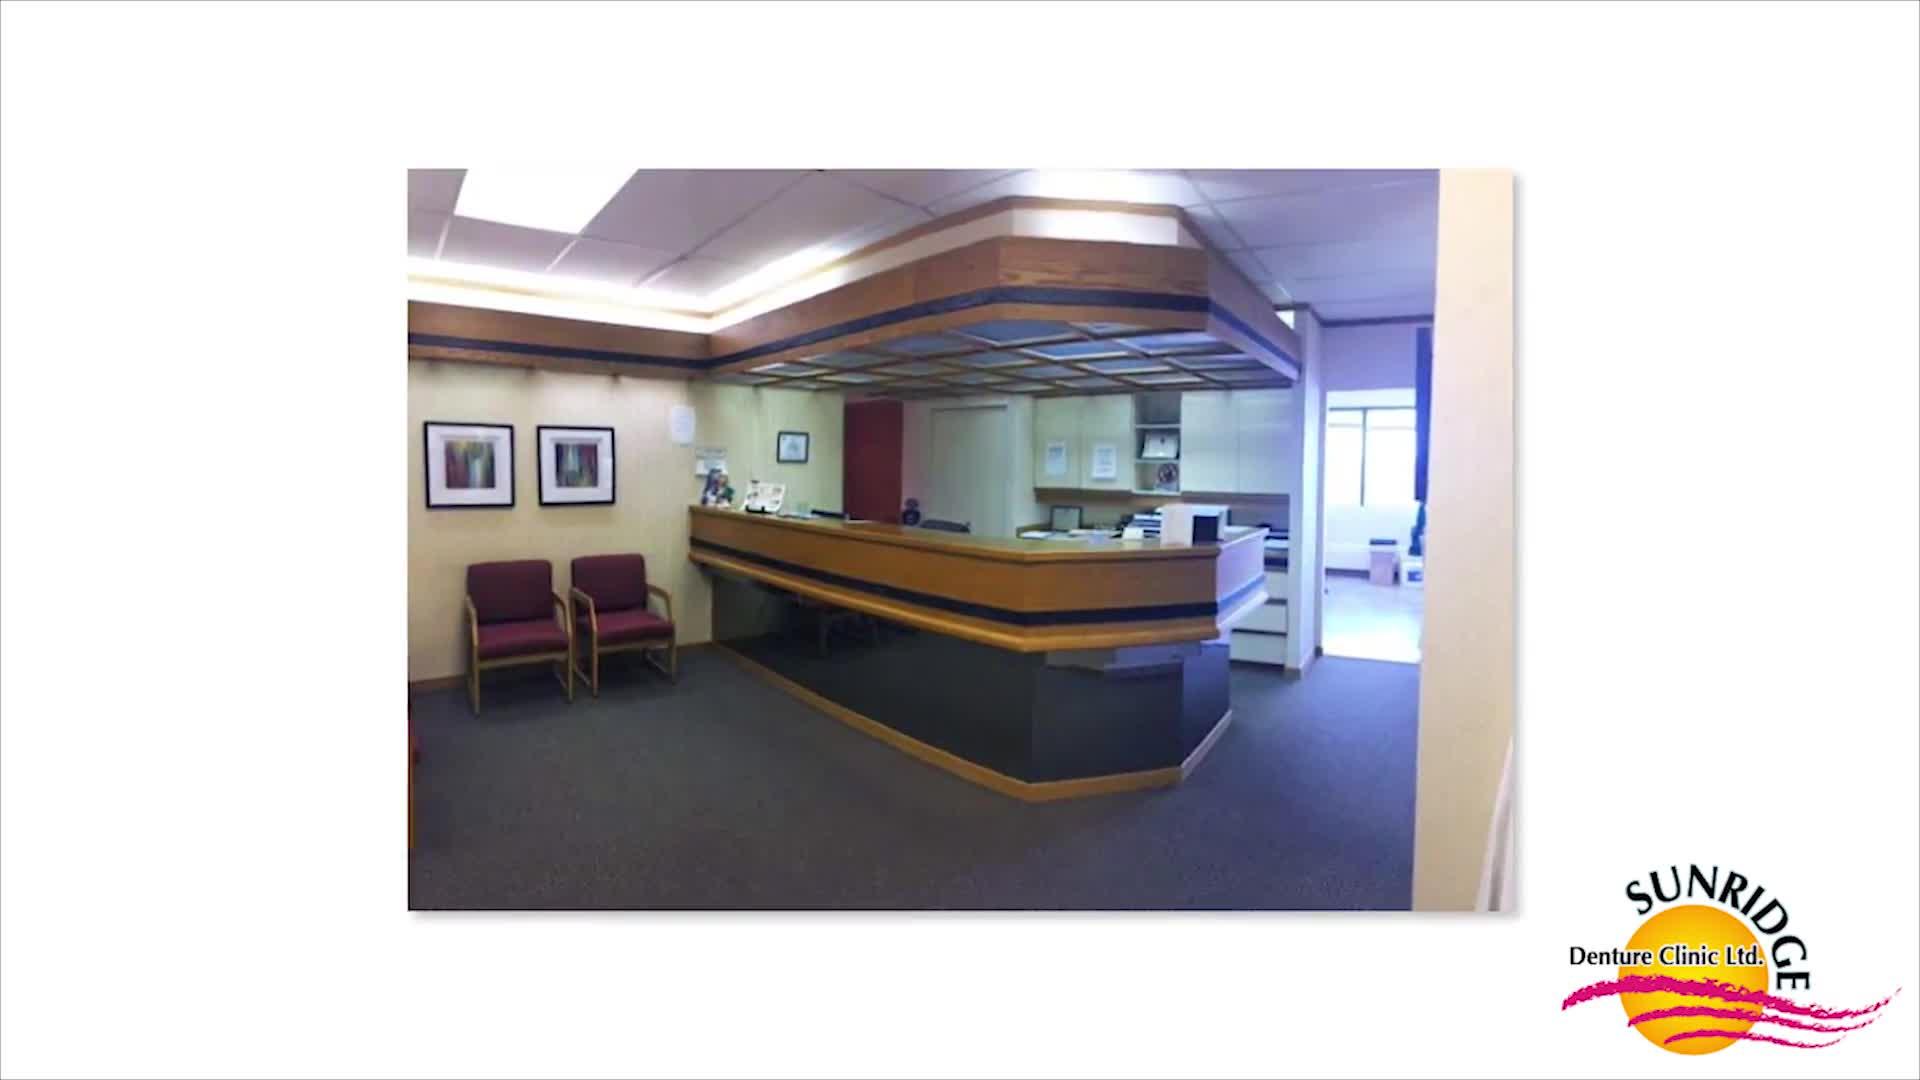 Sunridge Denture Clinic - Clinics - 403-291-2434